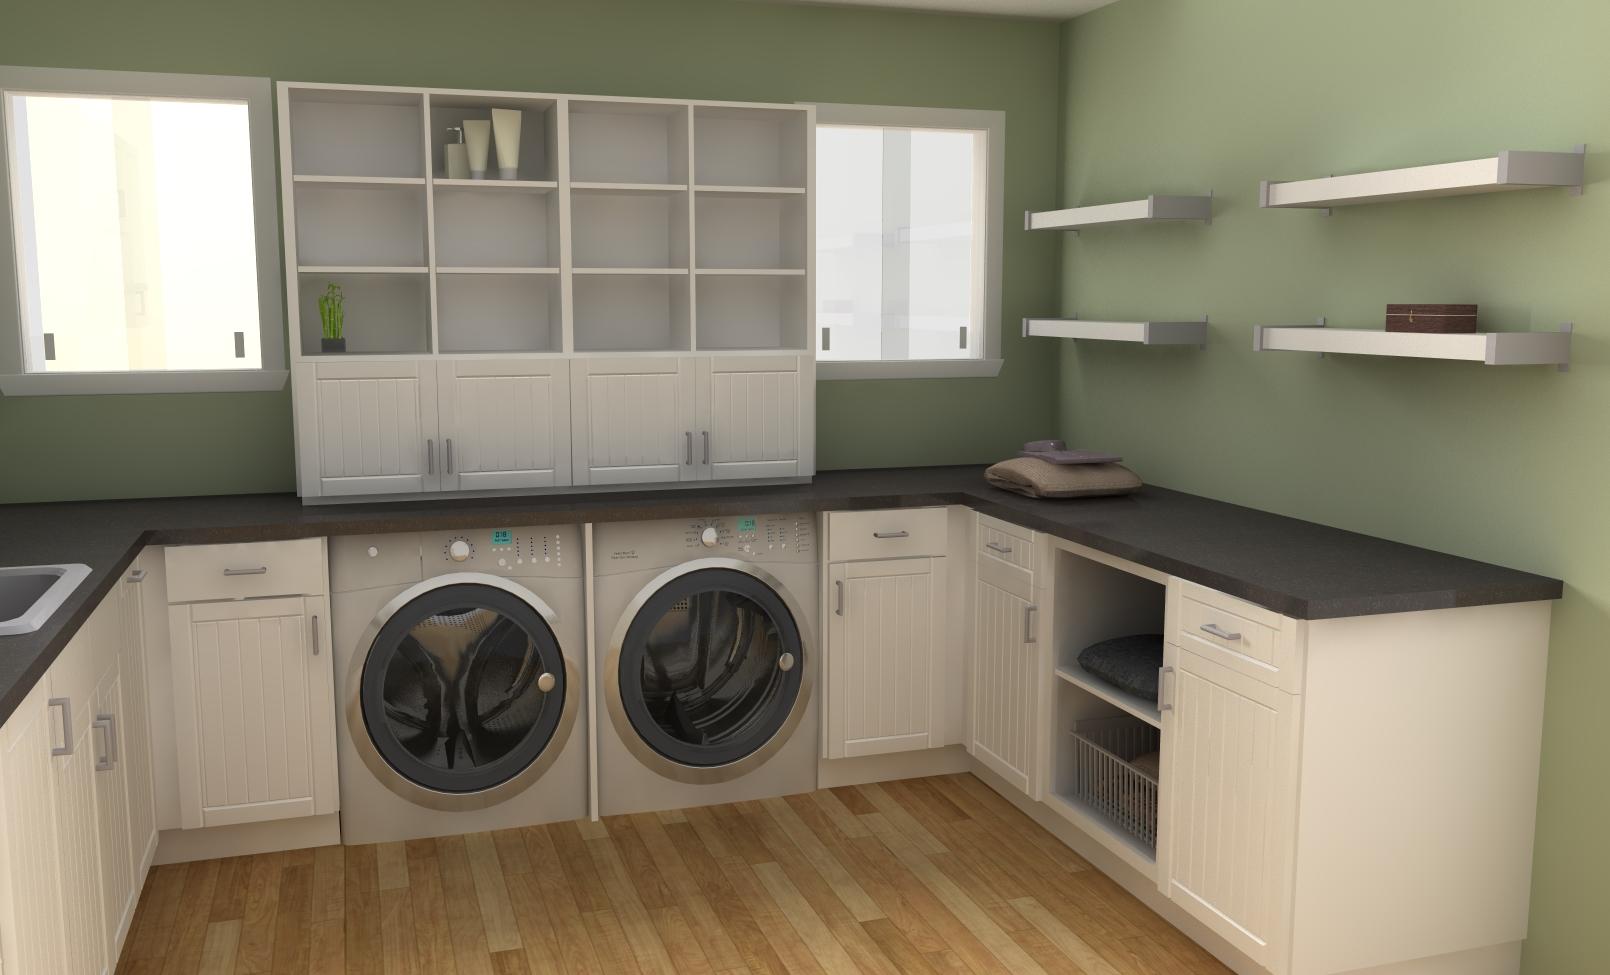 Laundry Room Fixtures